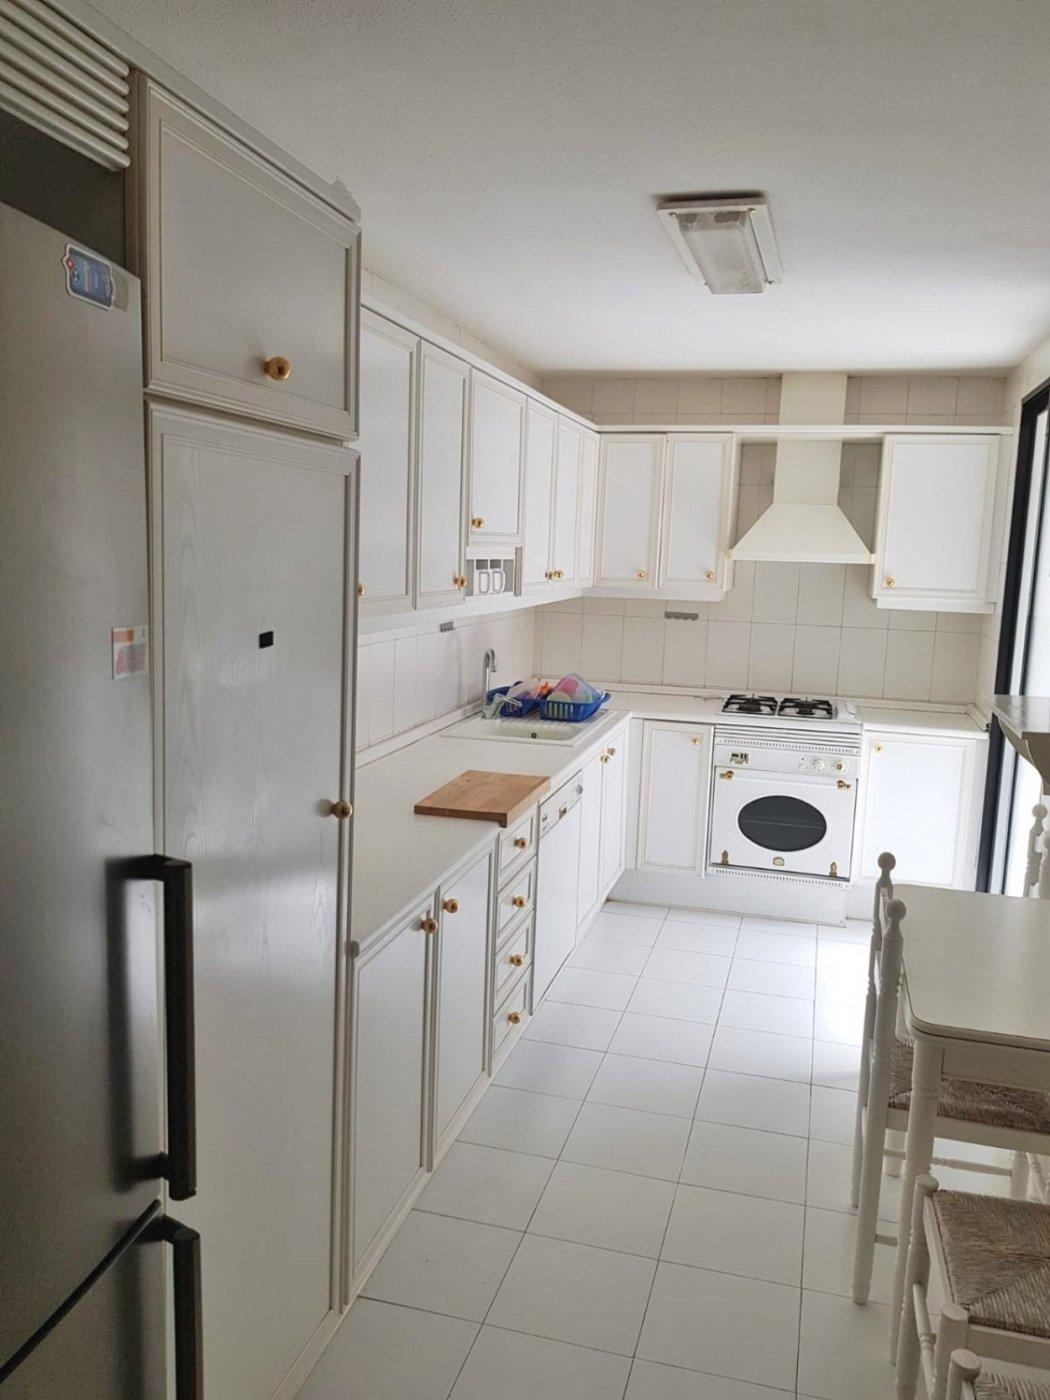 Flat for rent in Santa Maria de Gracia, Murcia